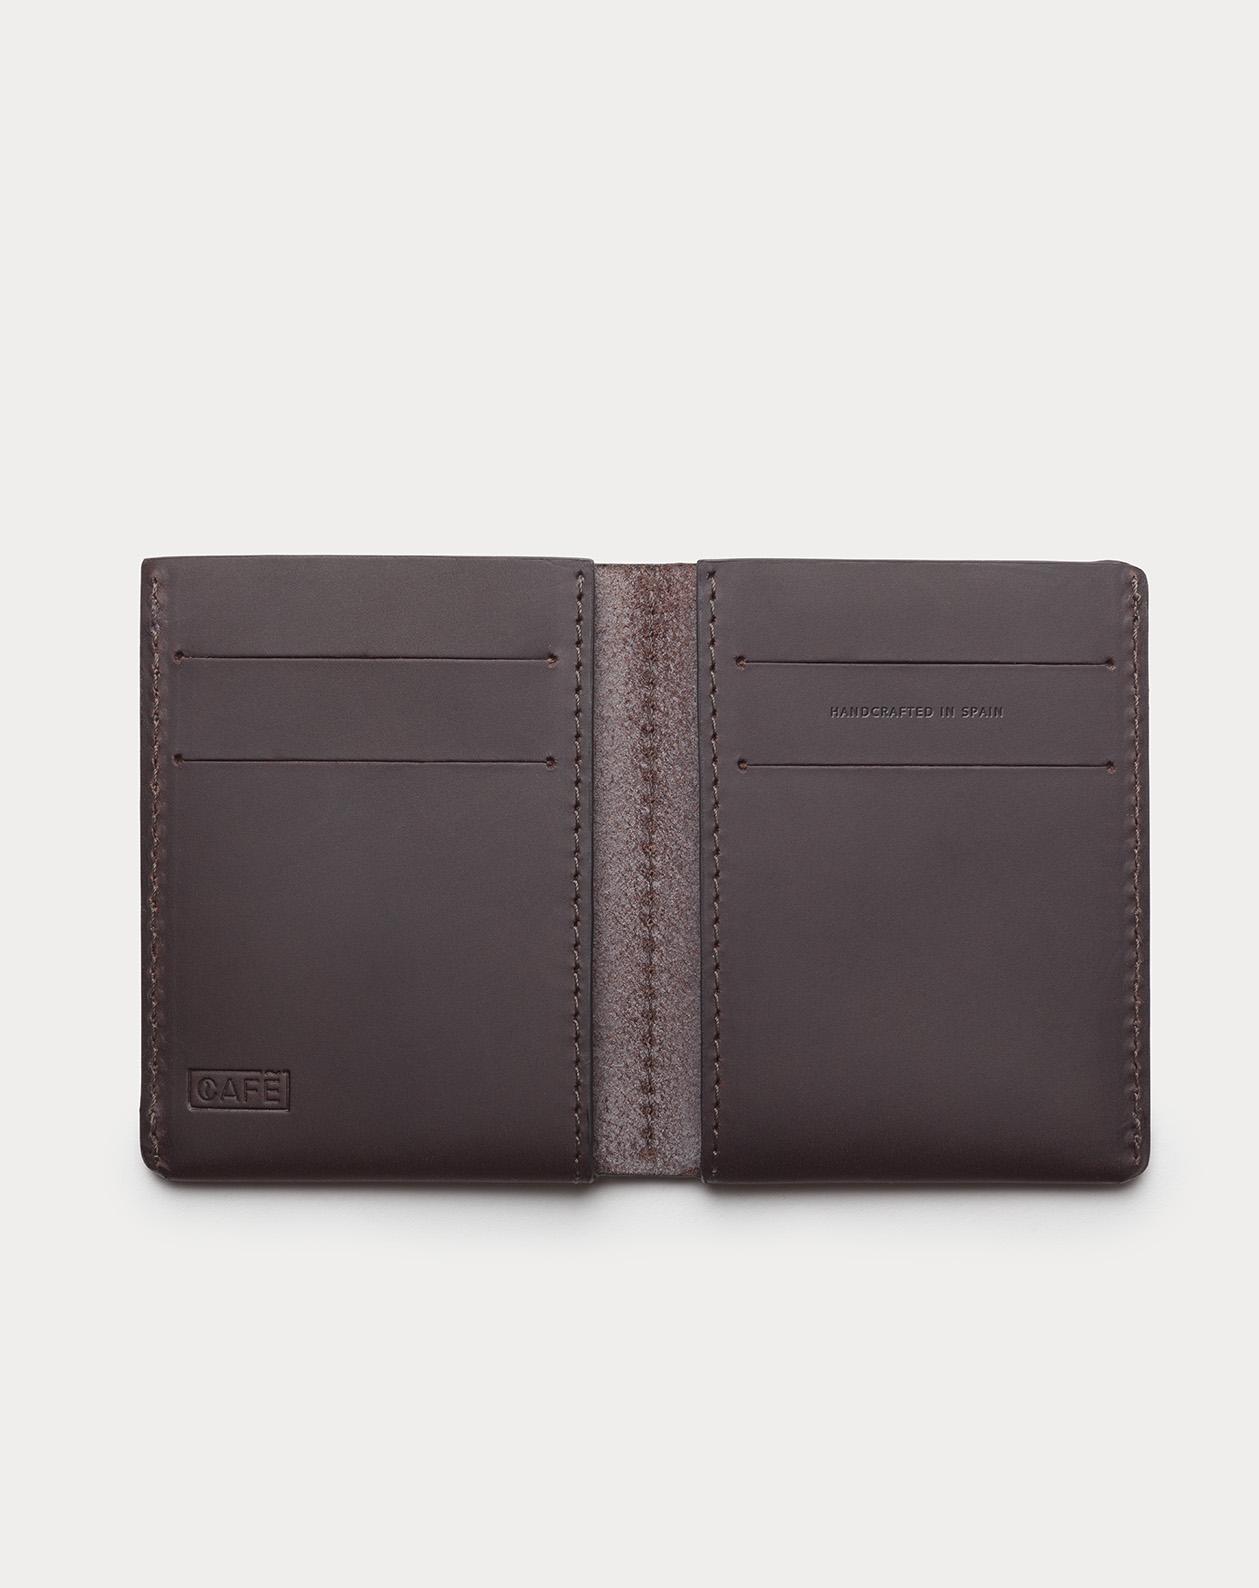 slim wallet black for cards and bills